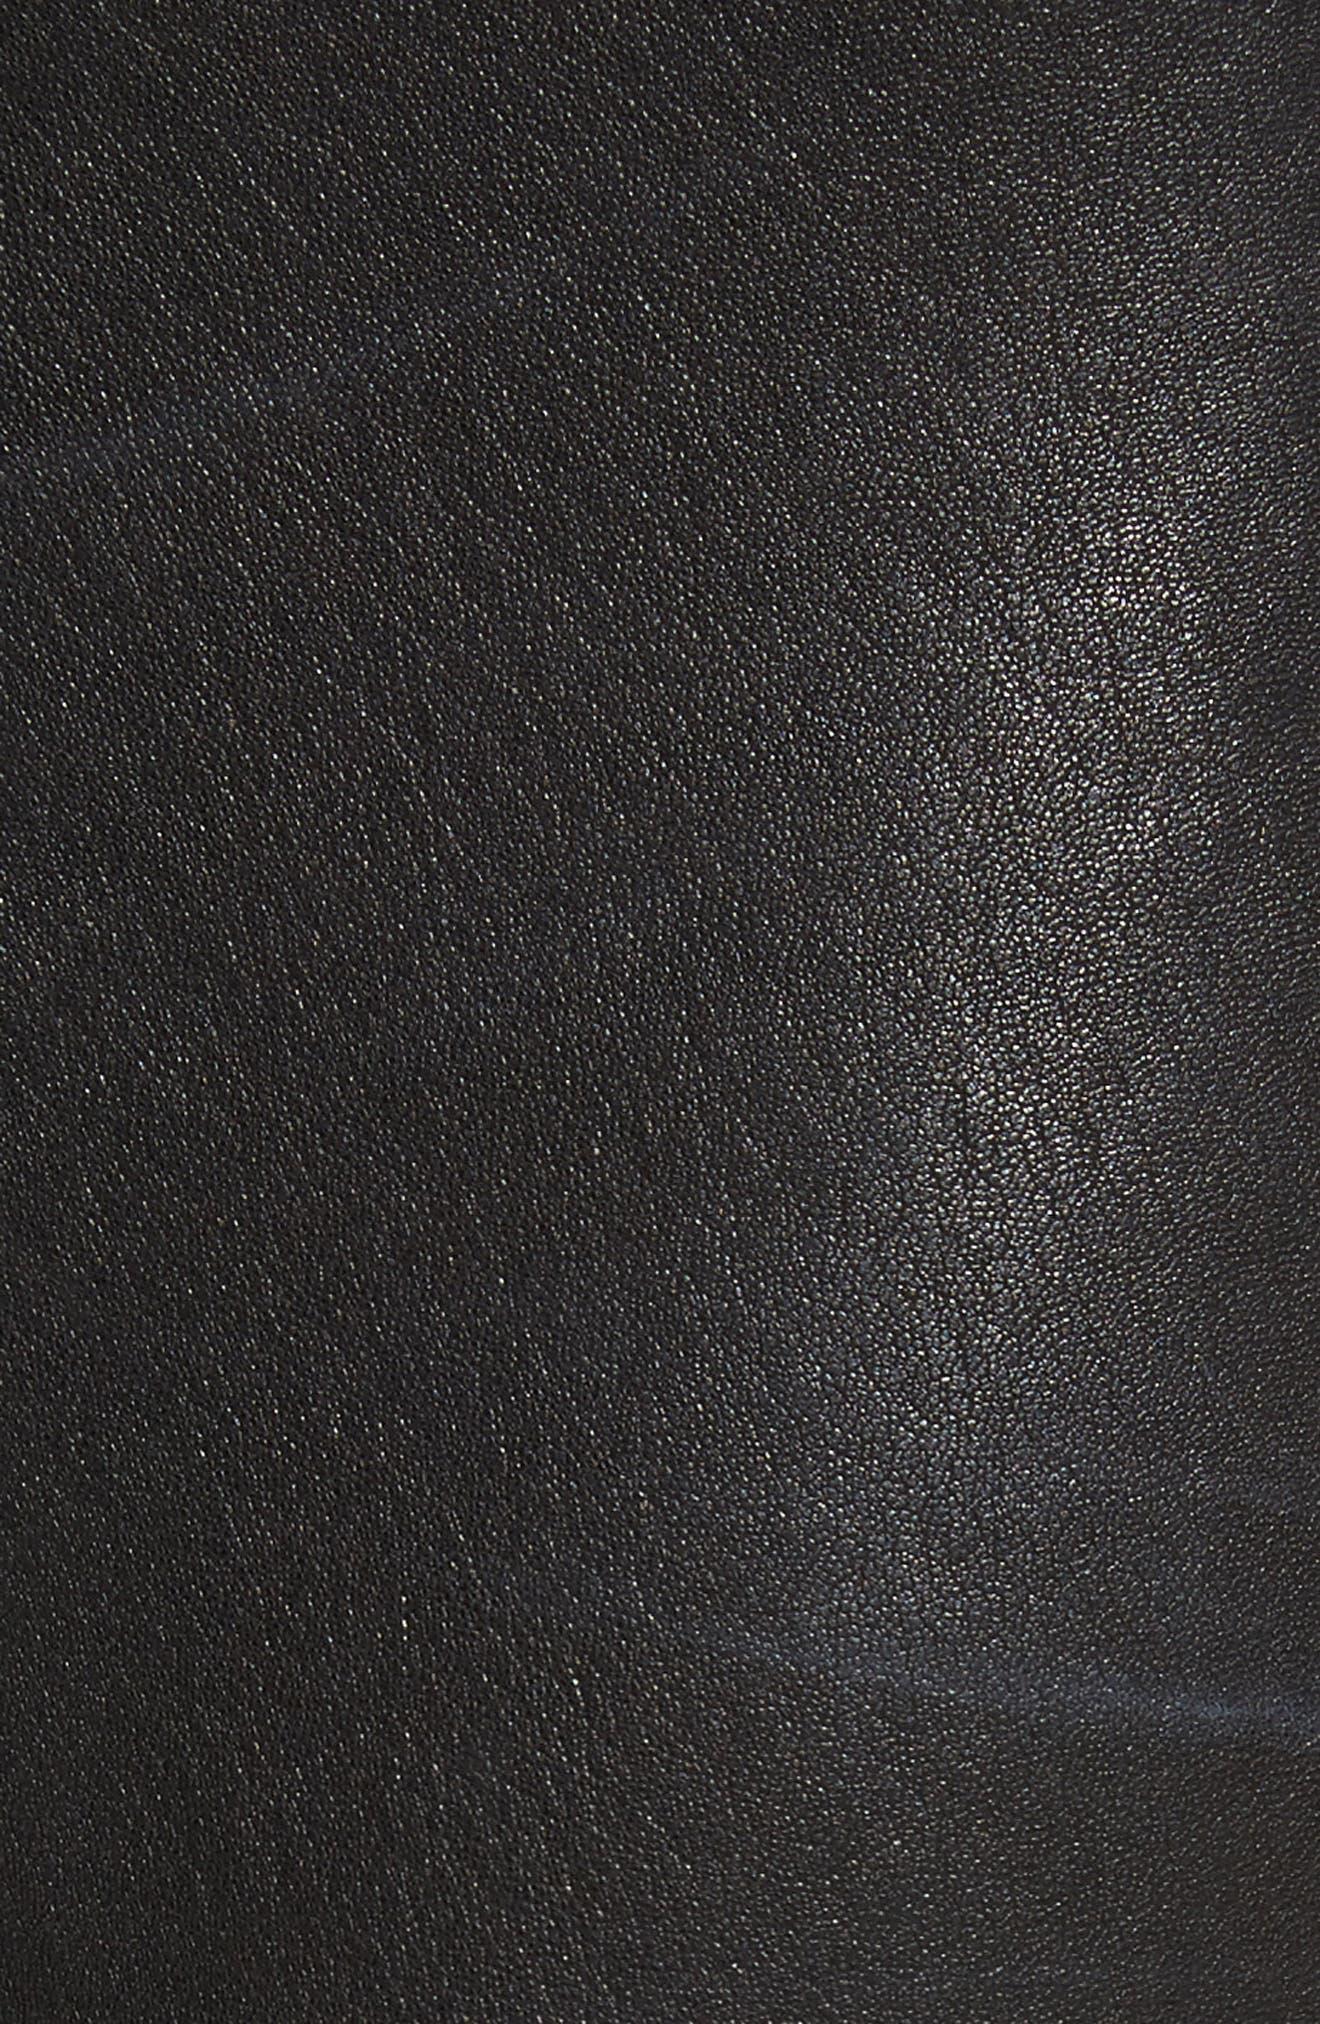 LAGENCE Adelaide High Waist Crop Leather Jeans,                             Alternate thumbnail 5, color,                             Noir